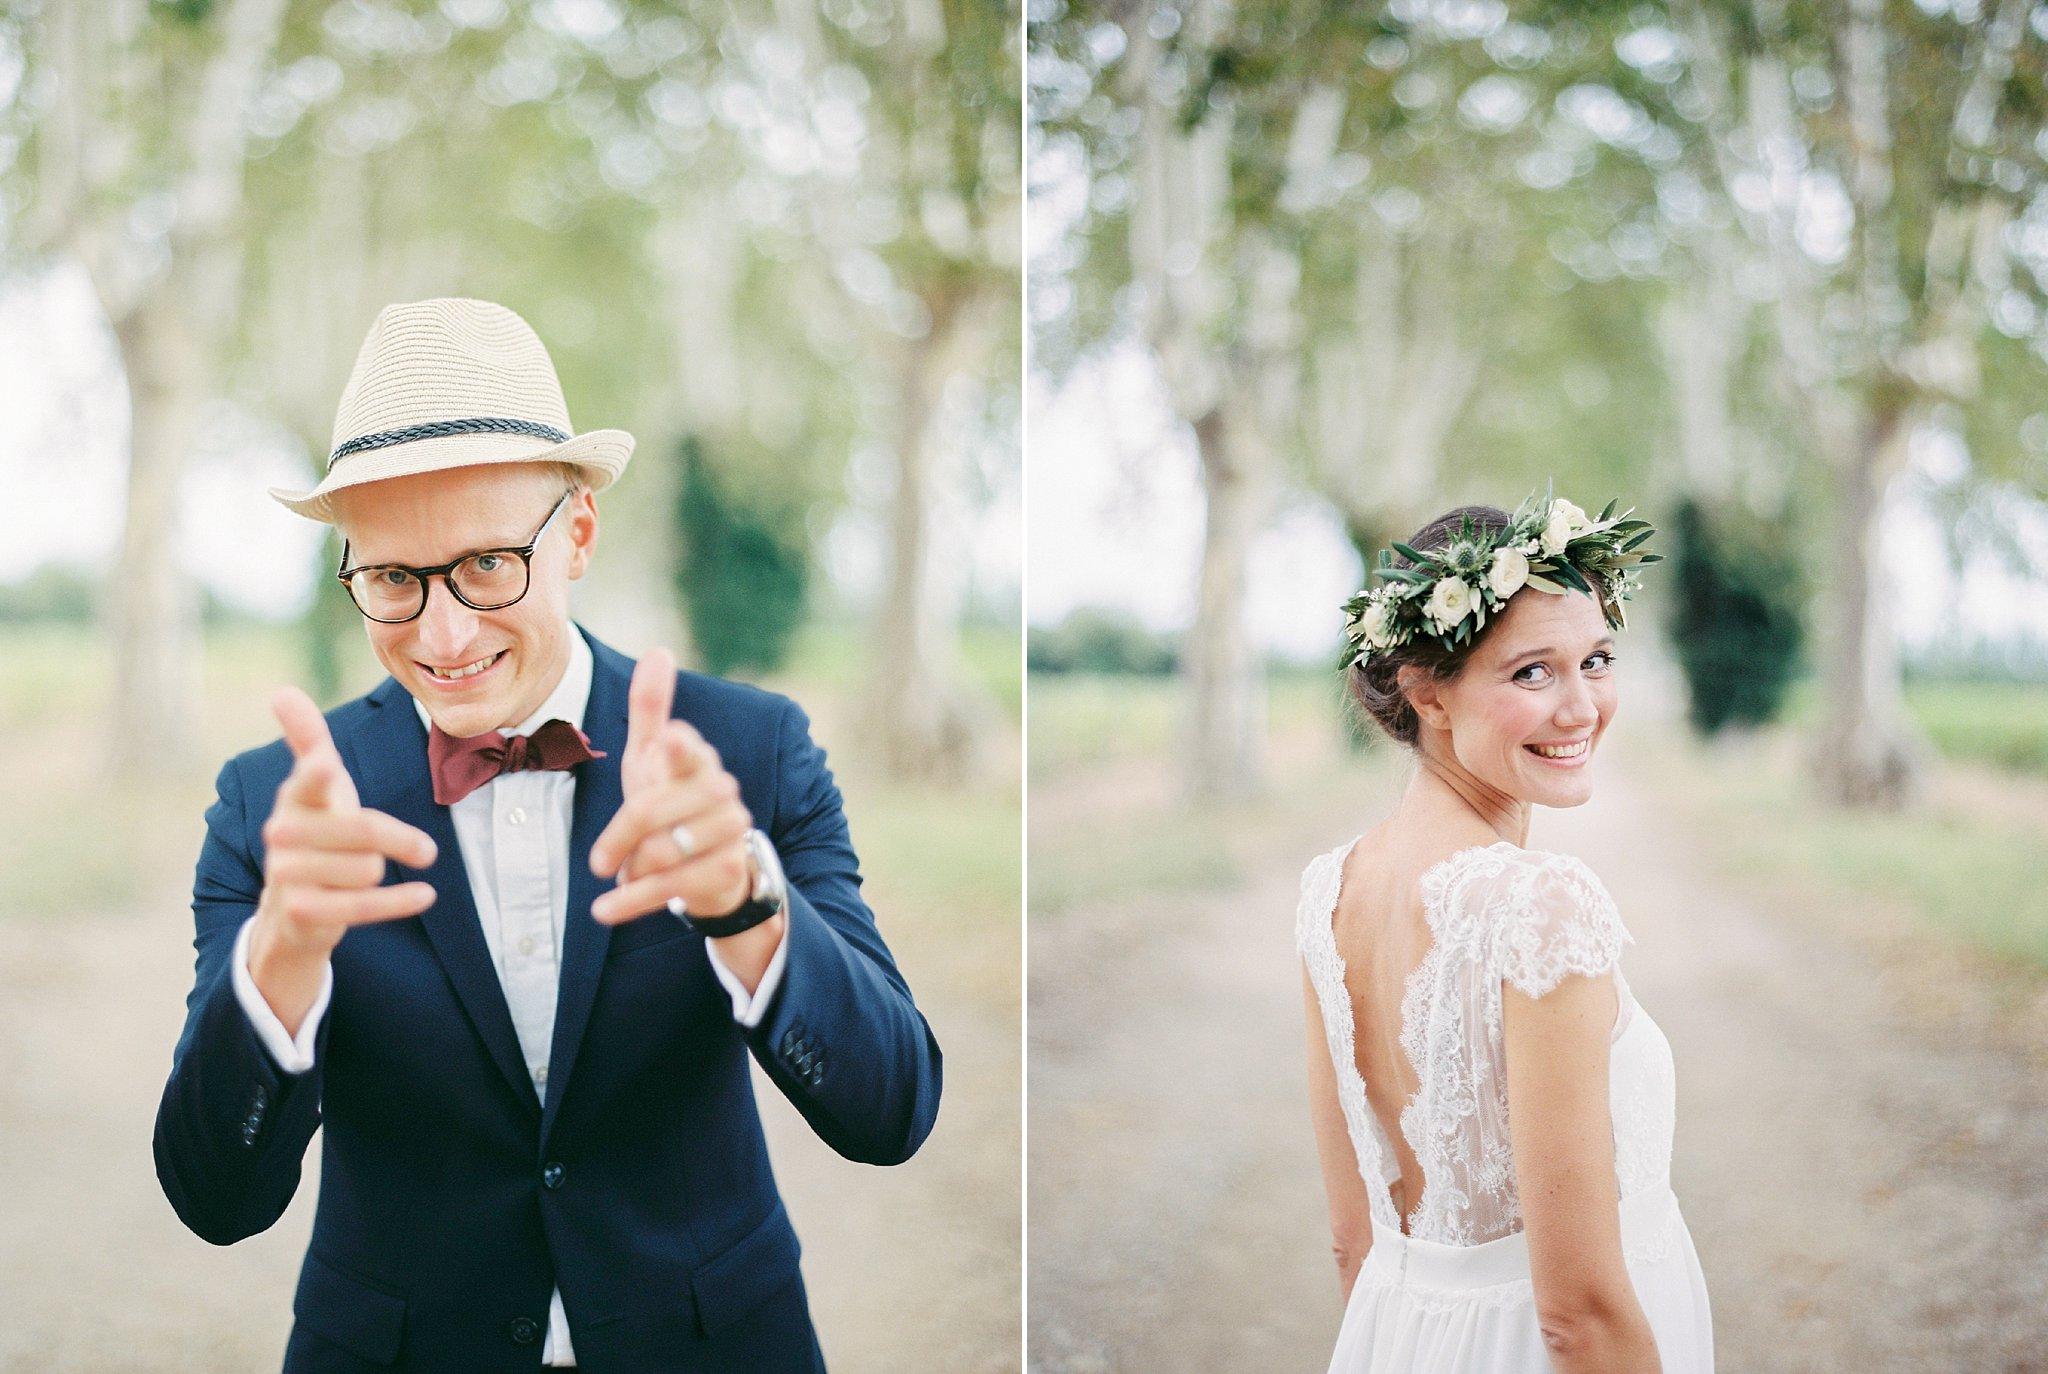 Wedding Photographer Perpignan - Château Las Collas Wedding - Hugo Hennequin021.jpg